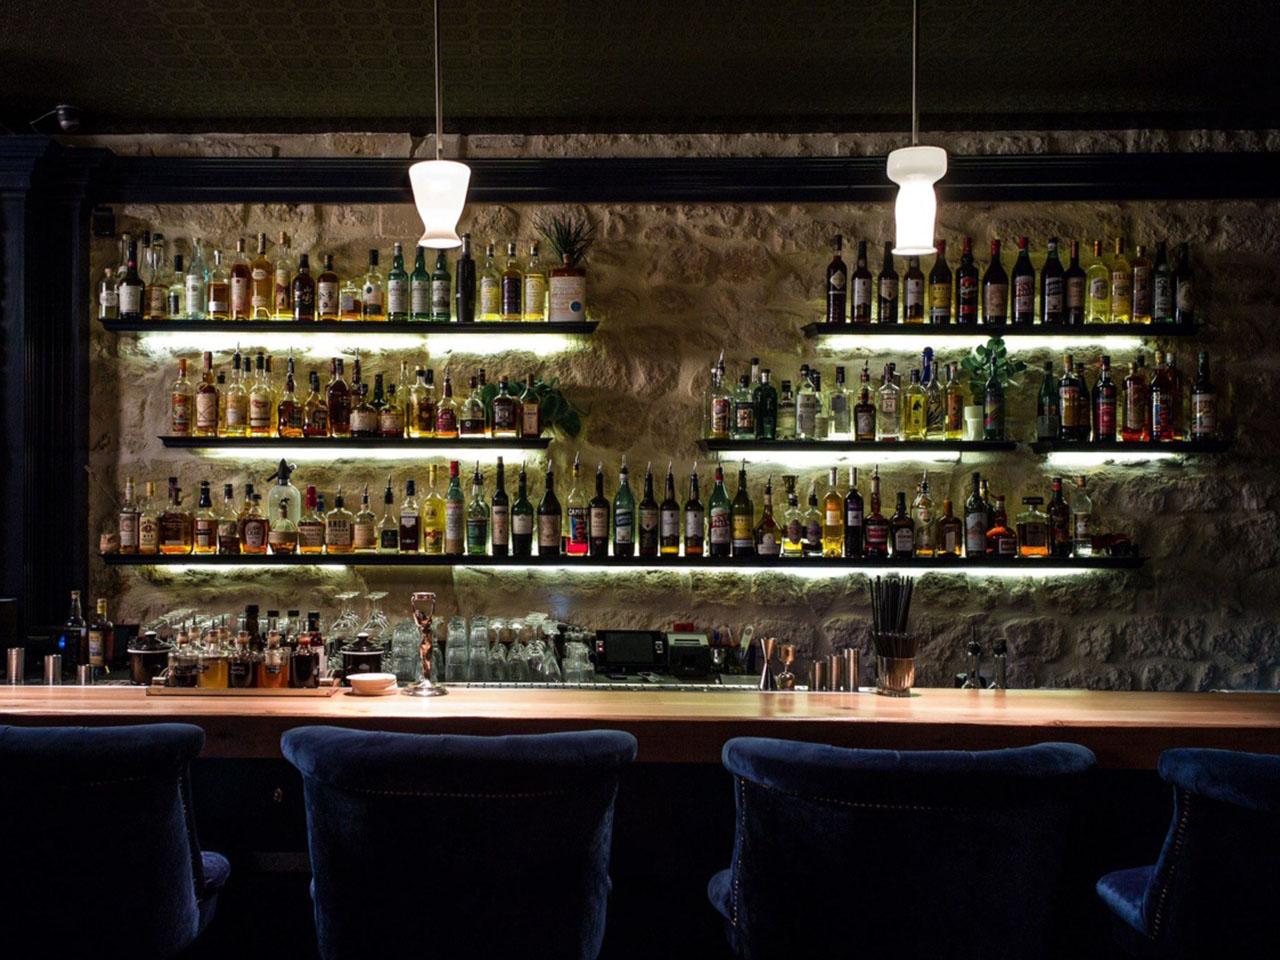 Listopedia: Speakeasy bars around the world